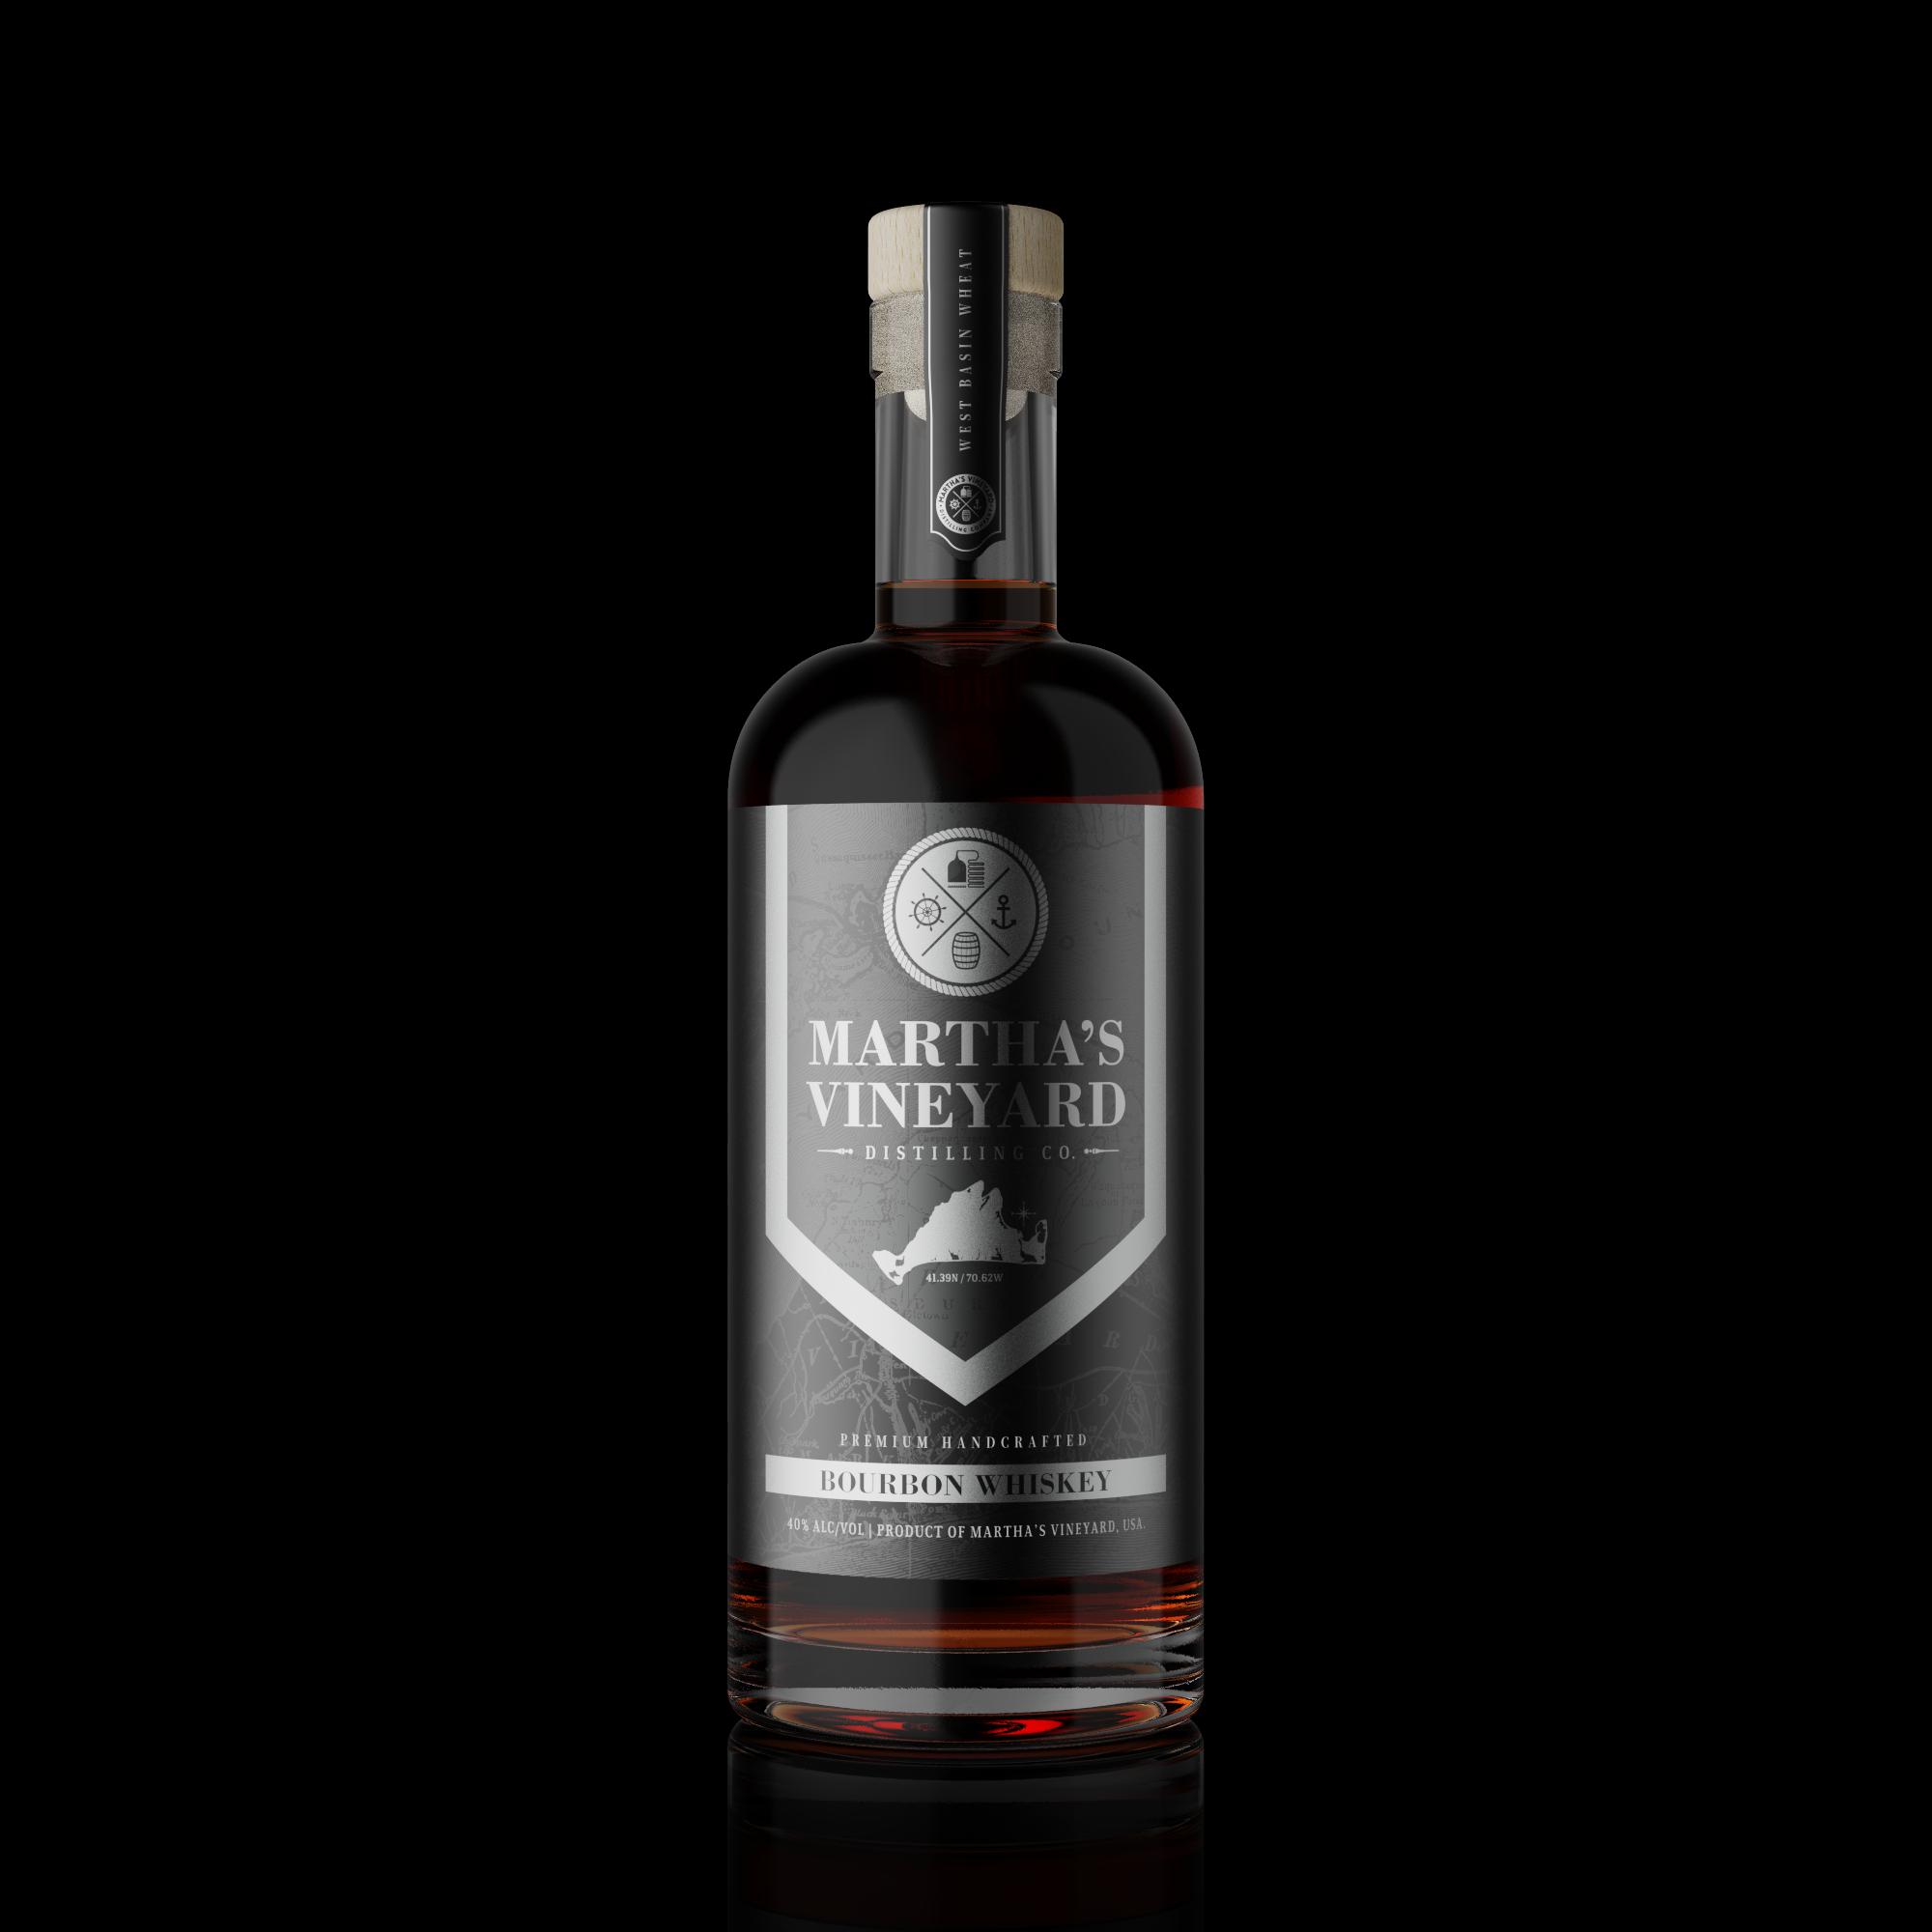 New bourbon bottle label